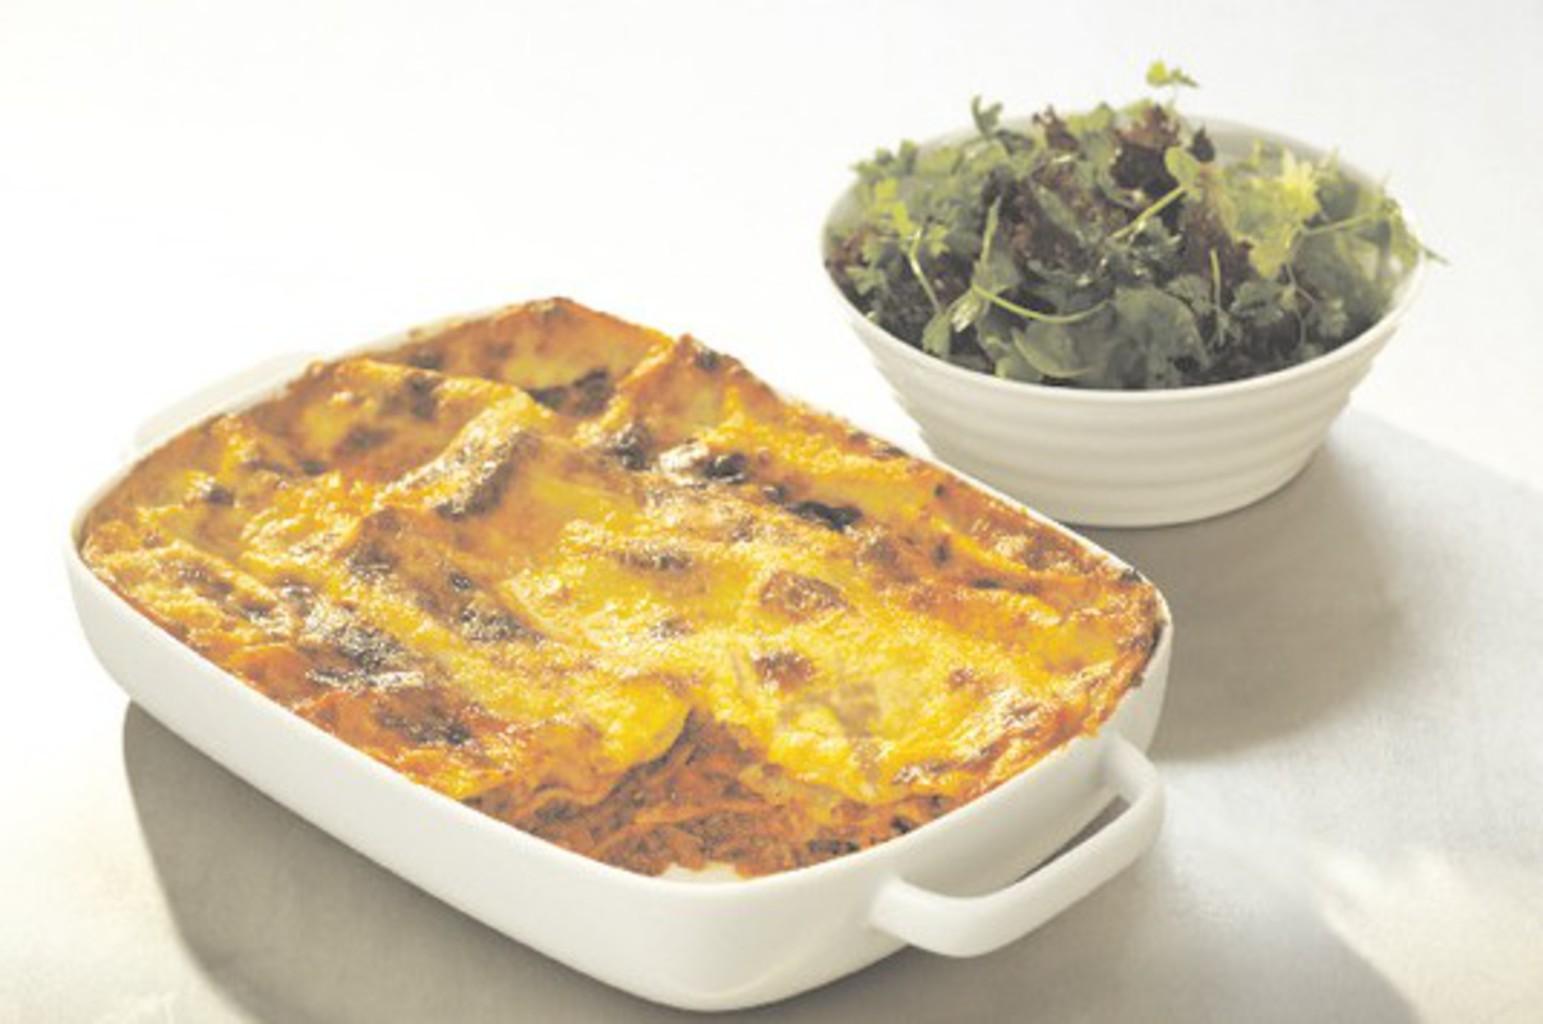 Ricetta Lasagne Kenwood.Ricetta Lasagne Ricette Kenwood Club